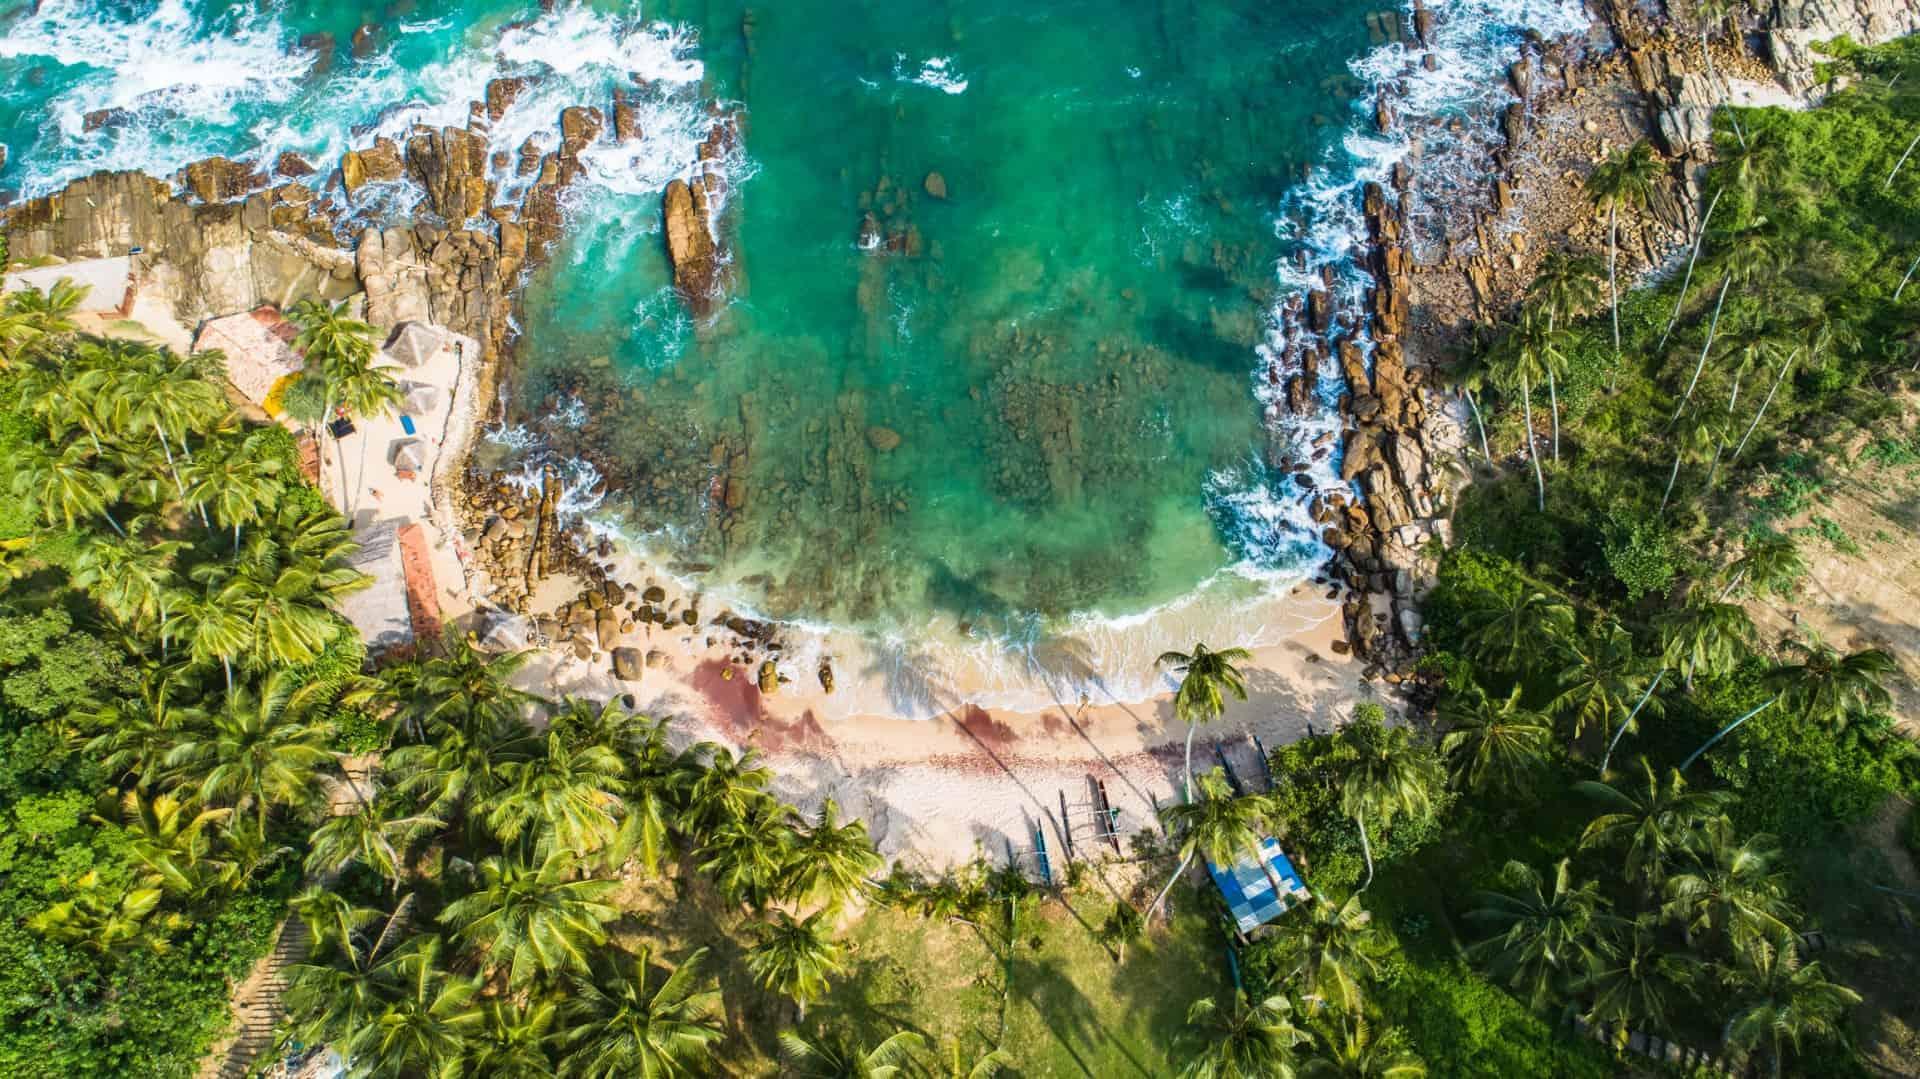 Aerial view of Goyambokka Beach, Sri Lanka